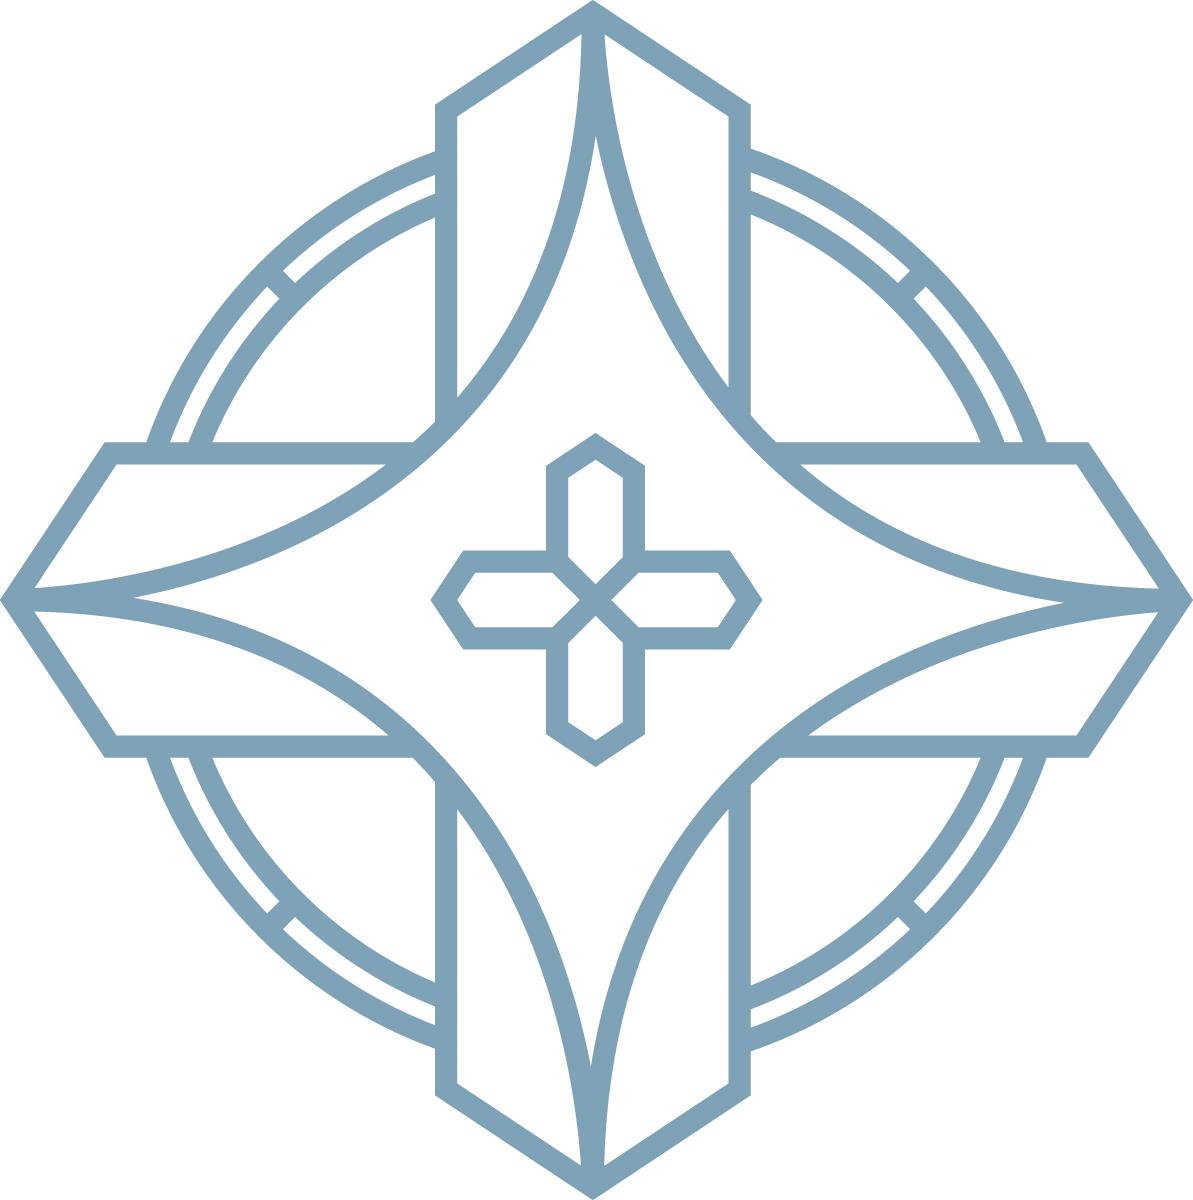 ppc_logo_2017_mark_blue_large.jpg